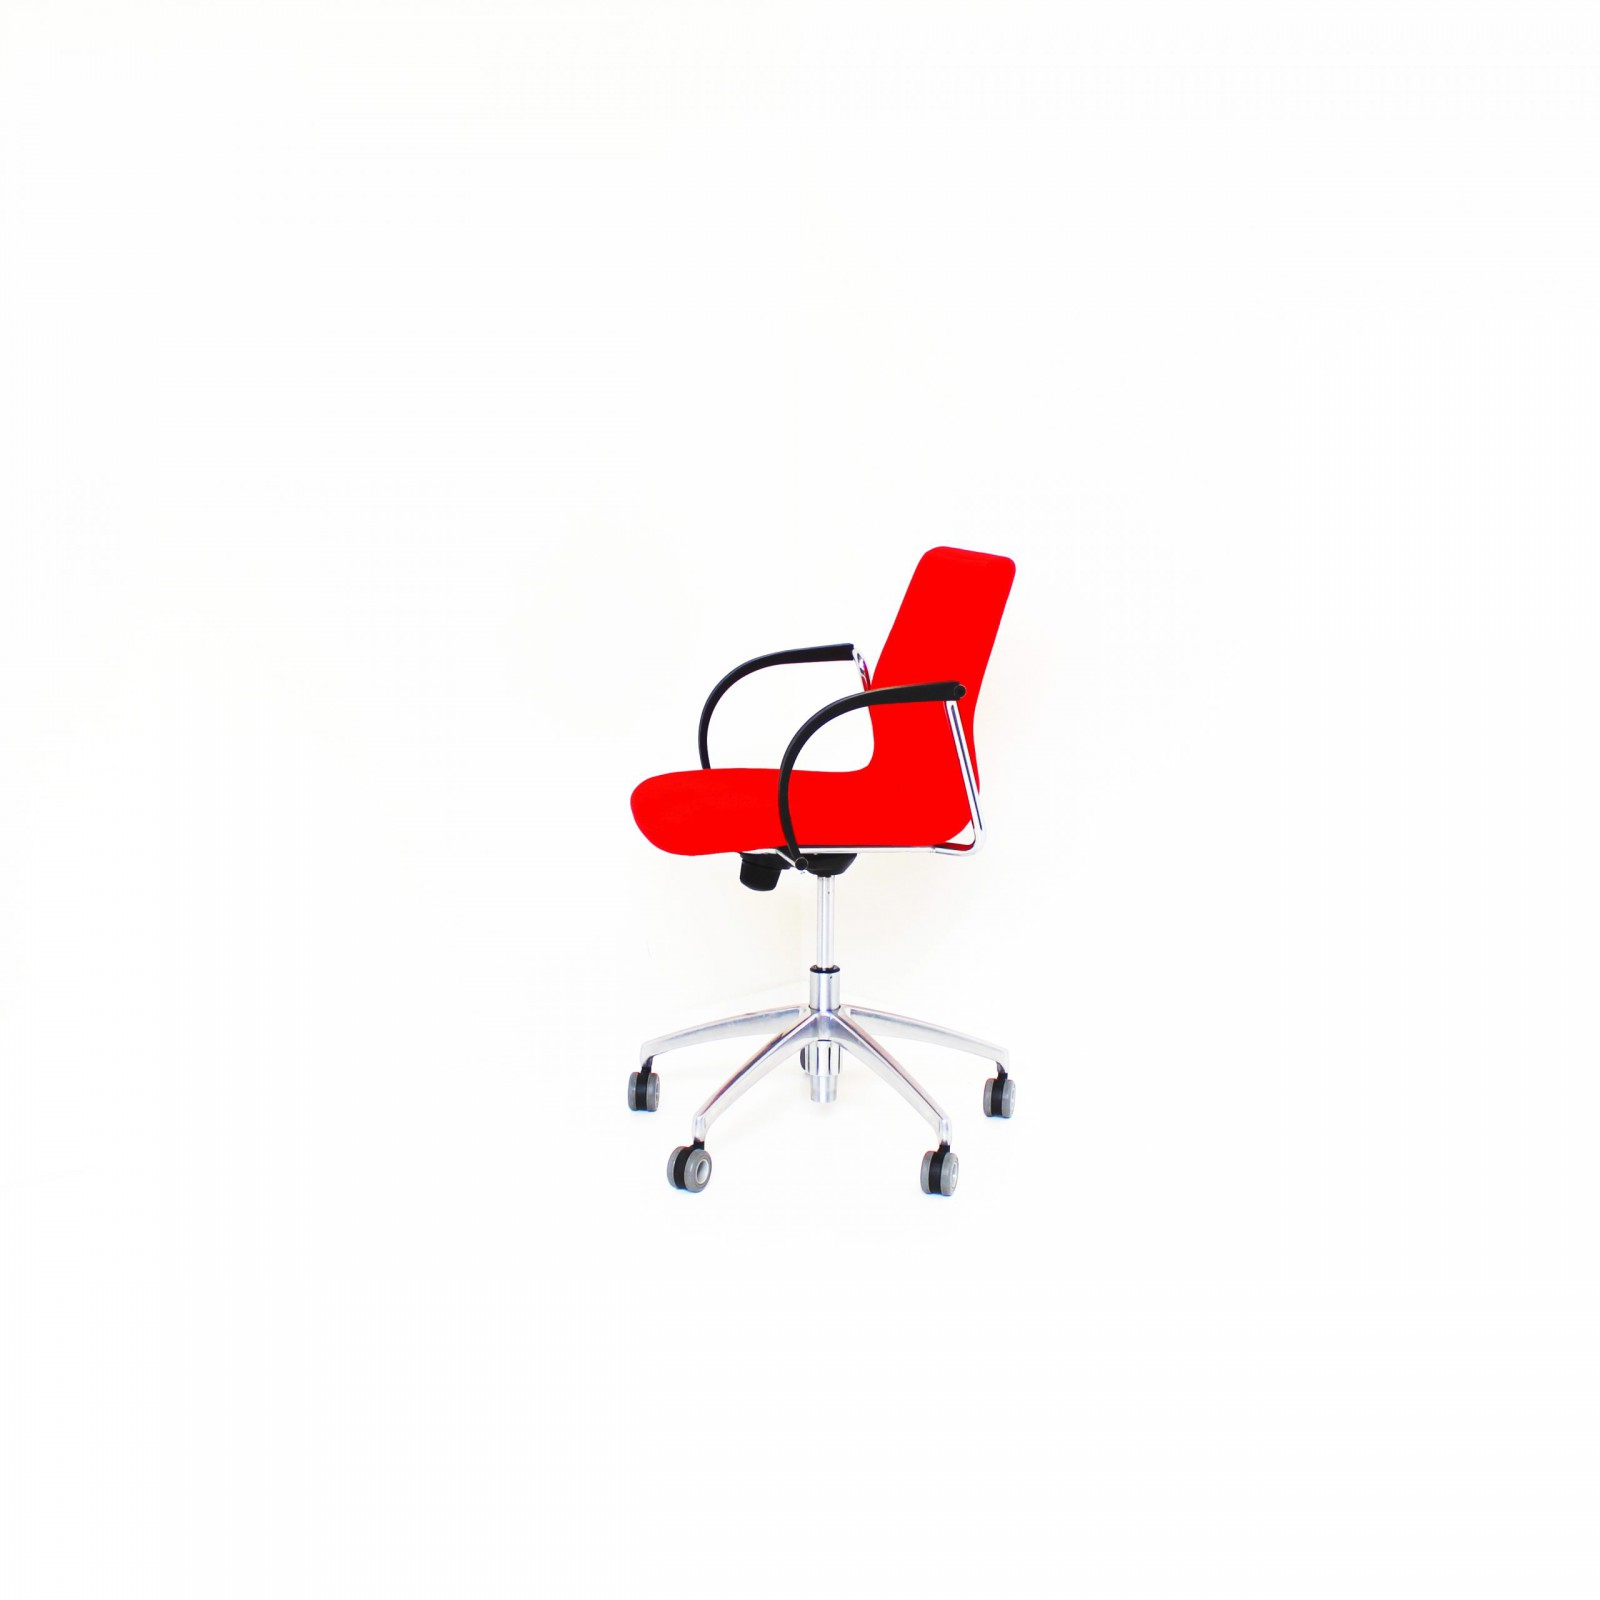 Kohl Vergader Bureaustoel – RM Kantoor Alkmaar